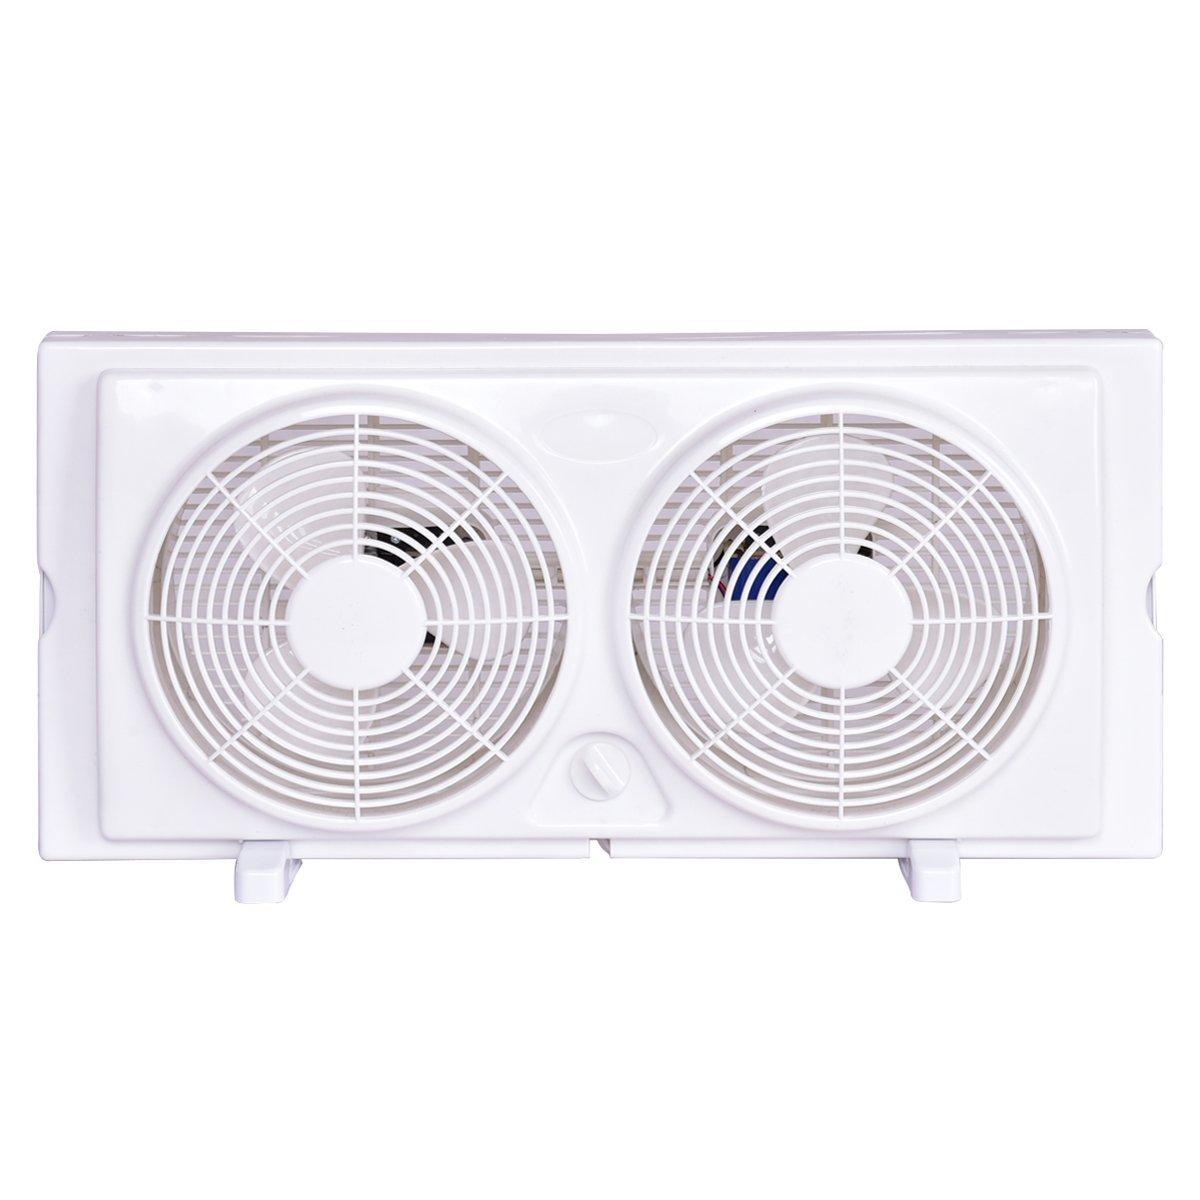 COSTWAY Twin Window Fan 7'' 2-Speed Setting Reversible Airflow Dual Blade Fan w/Manual Control and Removable Legs (White) by COSTWAY